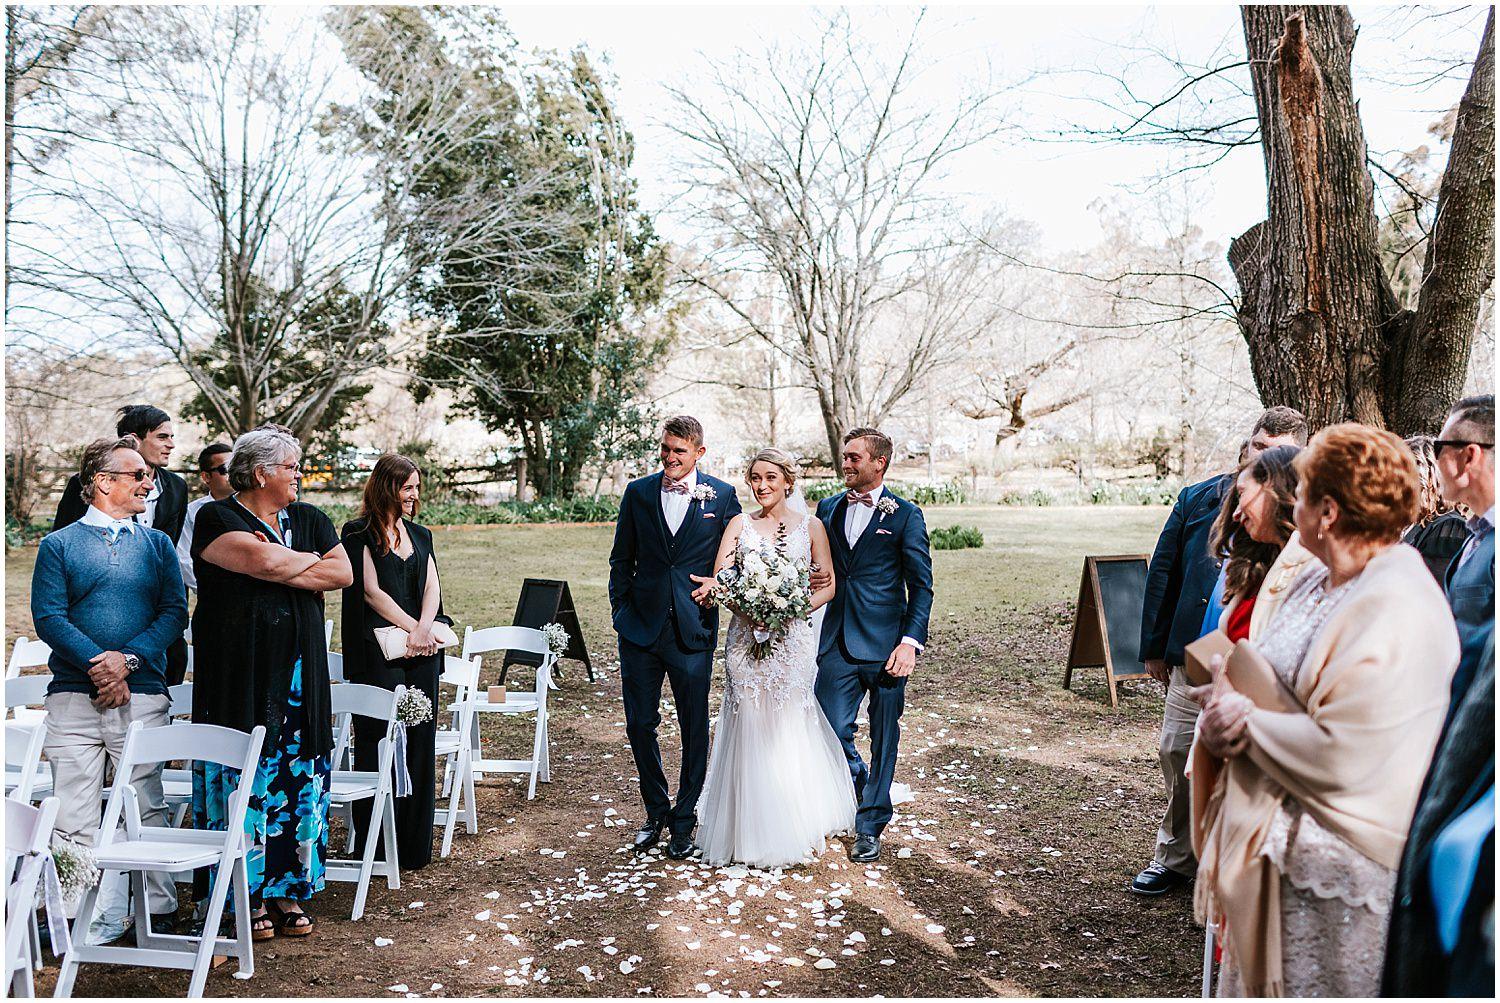 dominique-guy-montrose-berry-farm-wedding-_0025.jpg